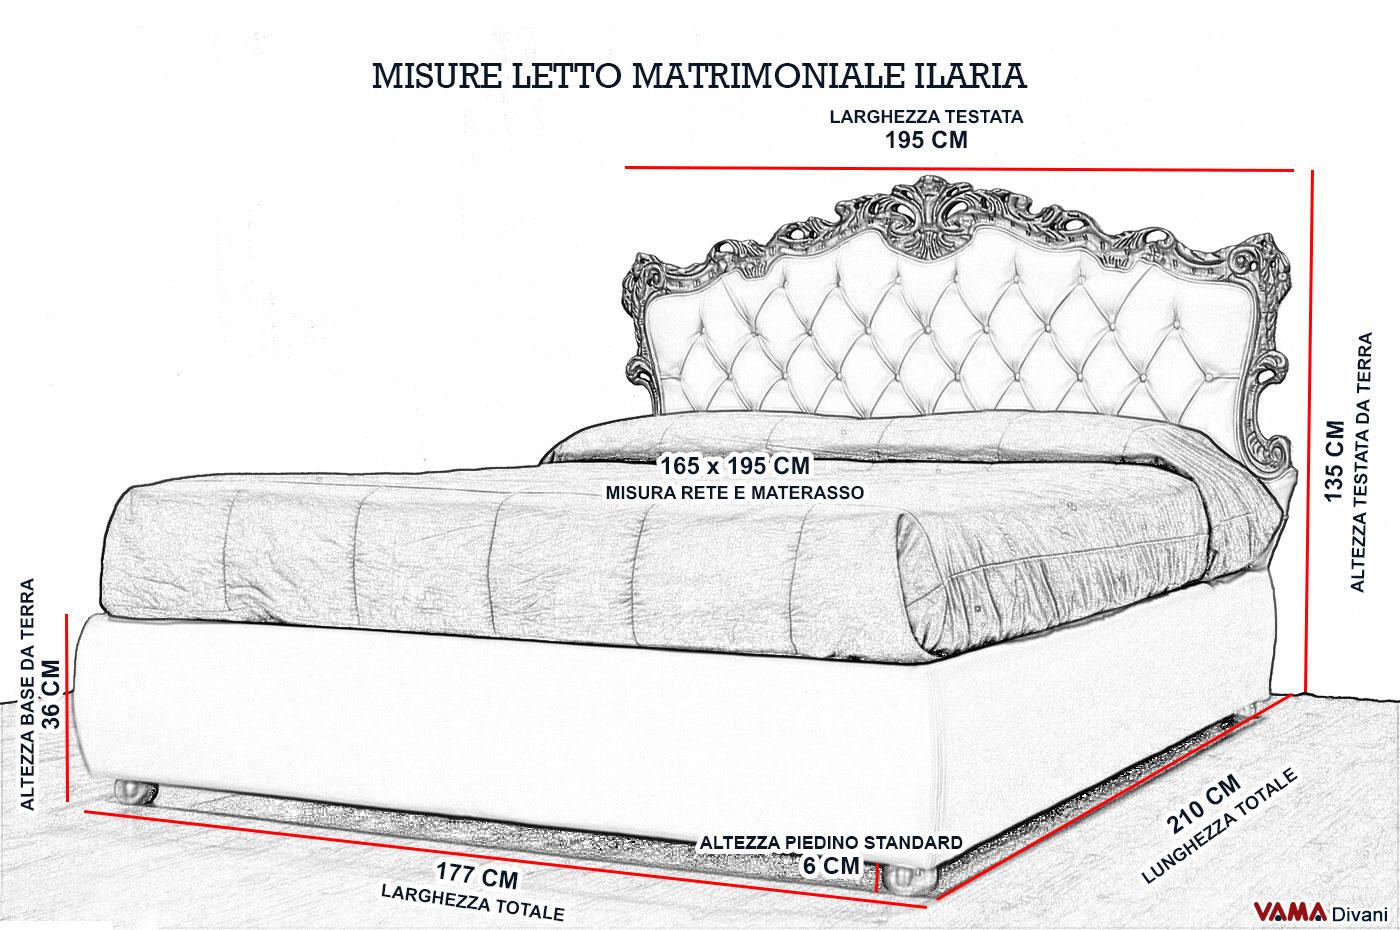 Stunning Larghezza Letto Matrimoniale Gallery - bakeroffroad.us ...